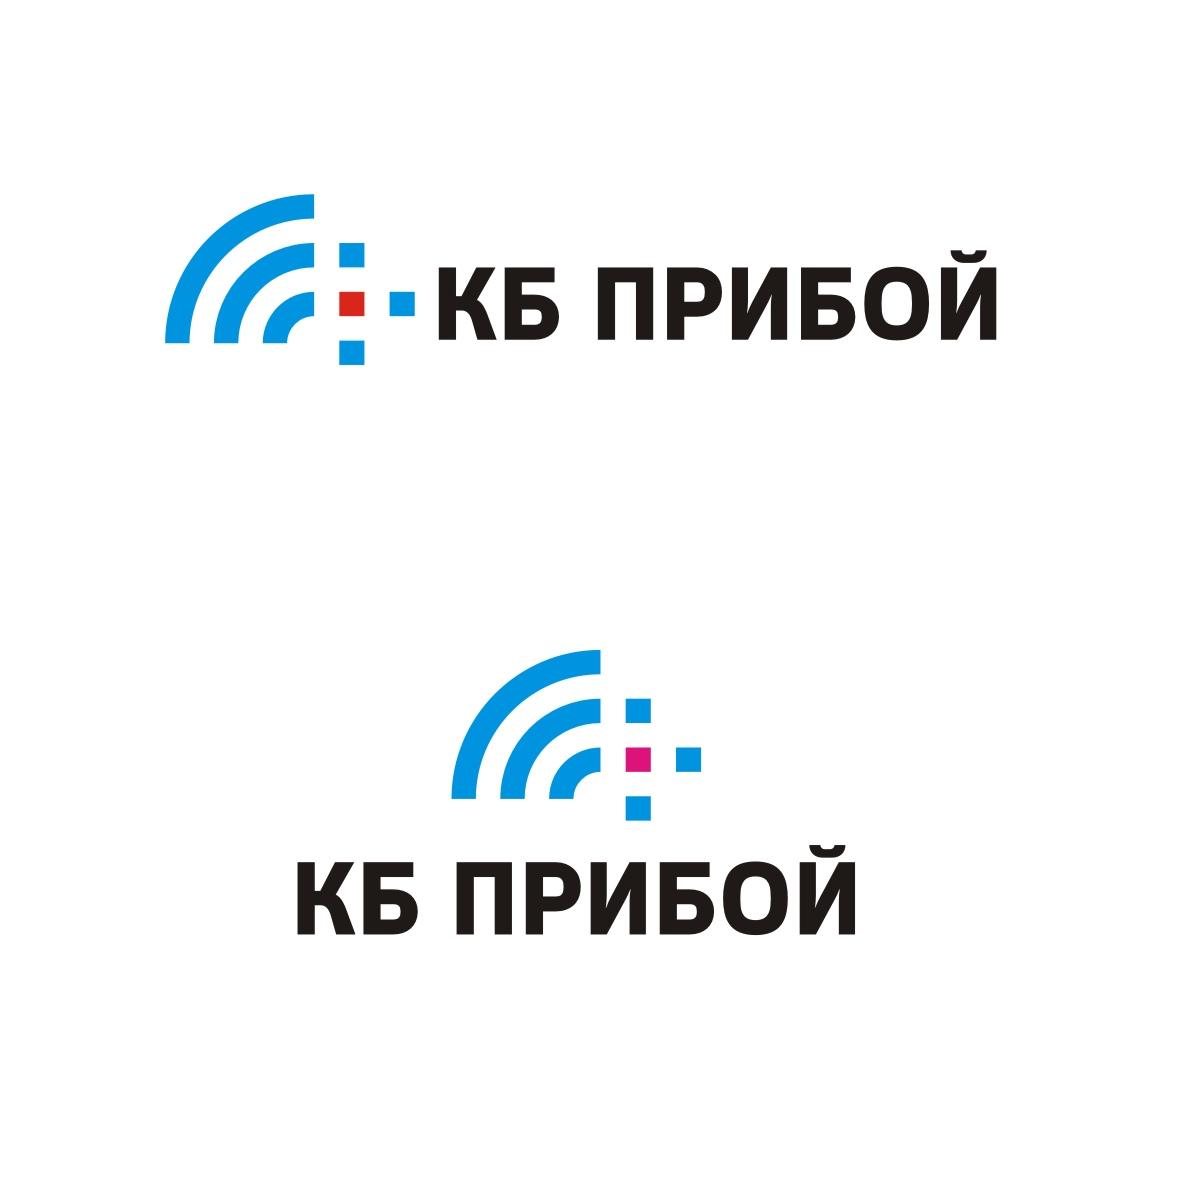 Разработка логотипа и фирменного стиля для КБ Прибой фото f_4805b27bb2cf1f0d.jpg